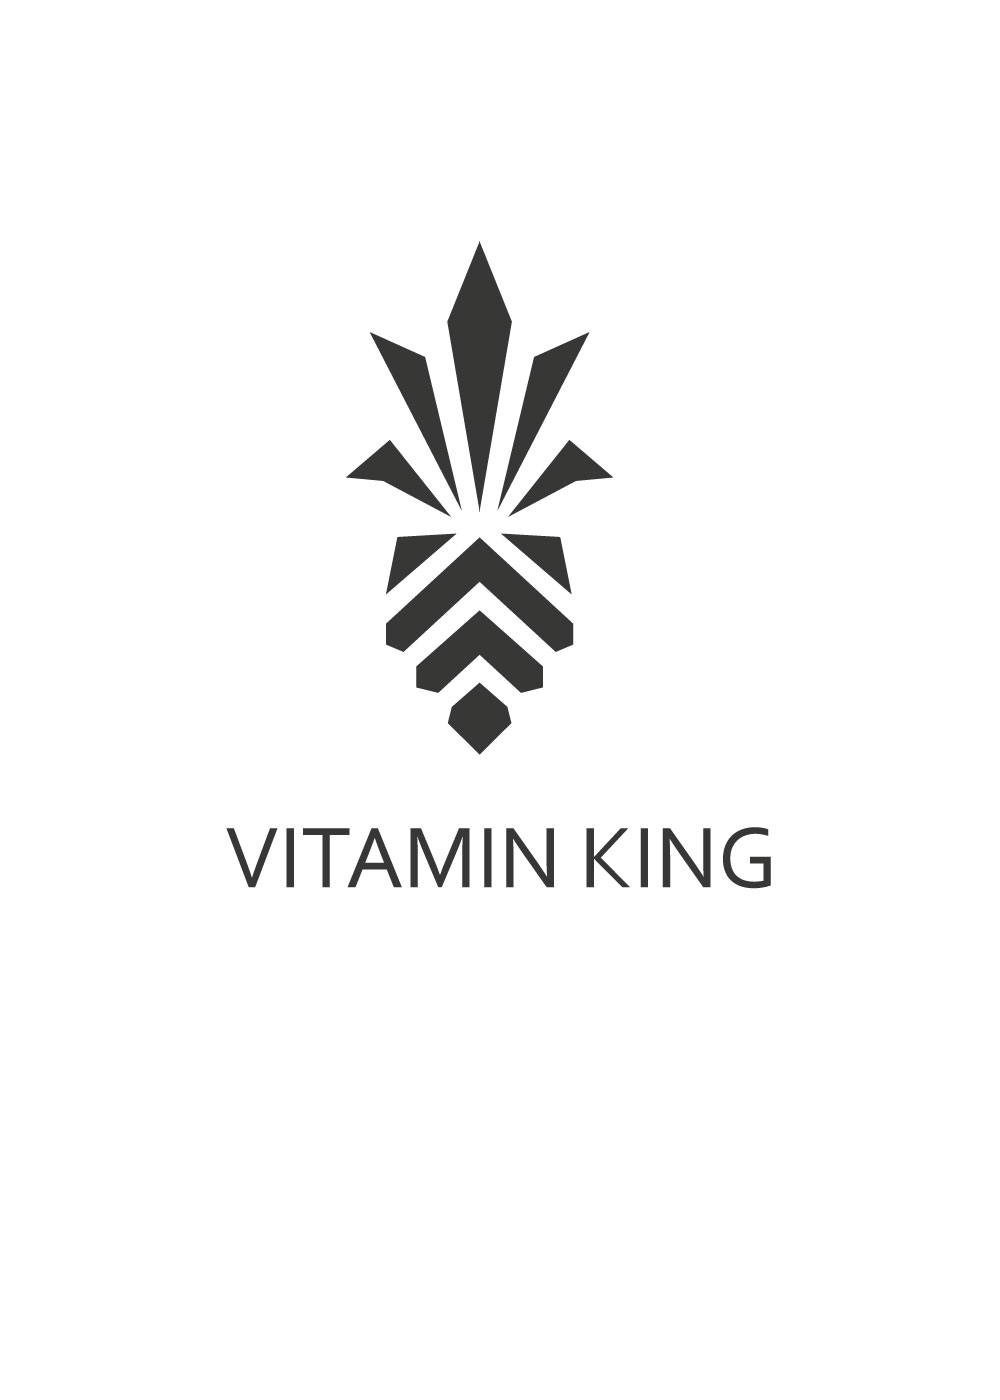 vitaminkinglogothubn